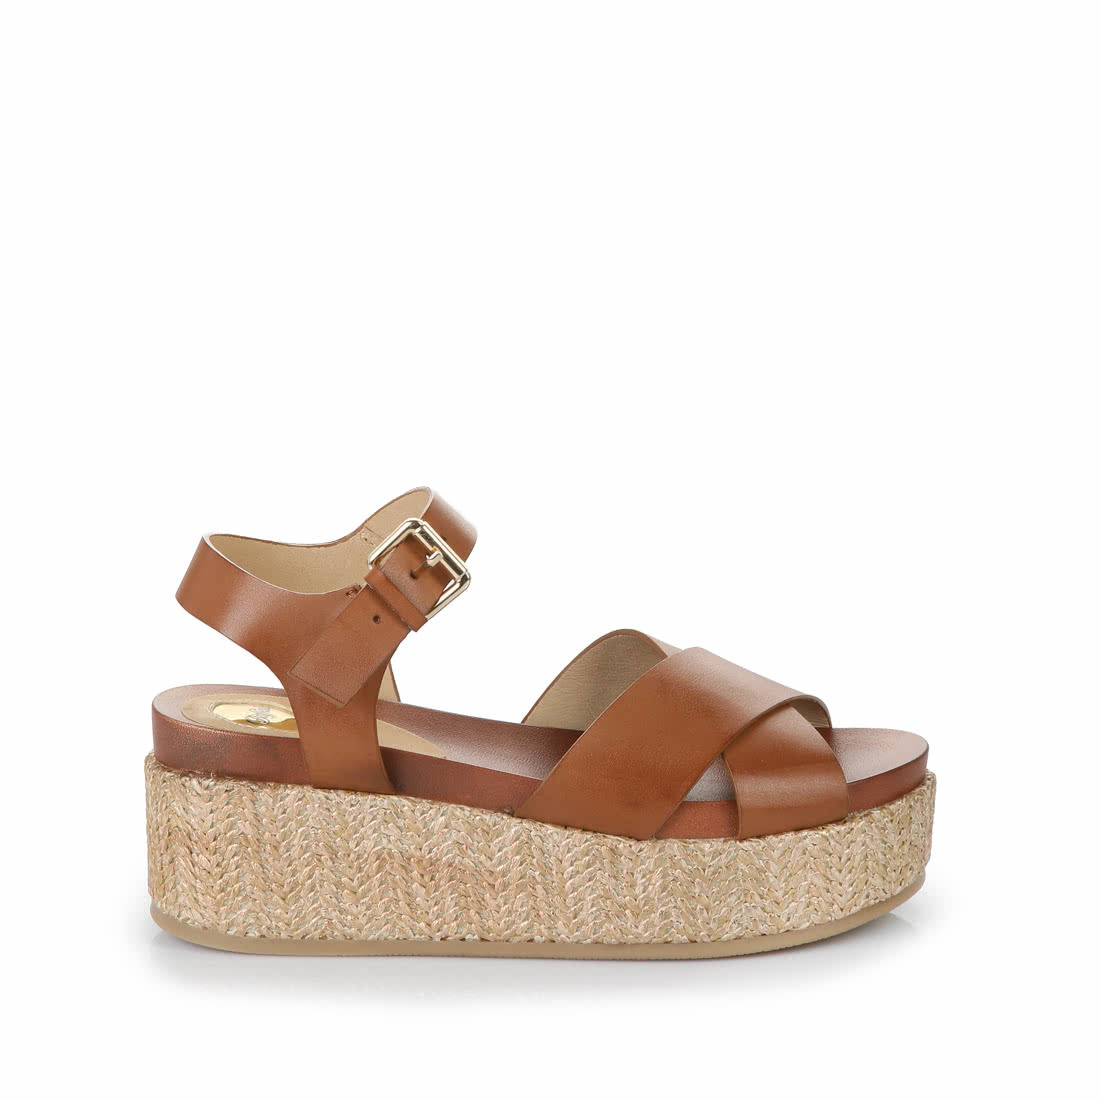 f0a8a97a7b9f Buffalo wedge sandals in cognac buy online in BUFFALO Online-Shop ...